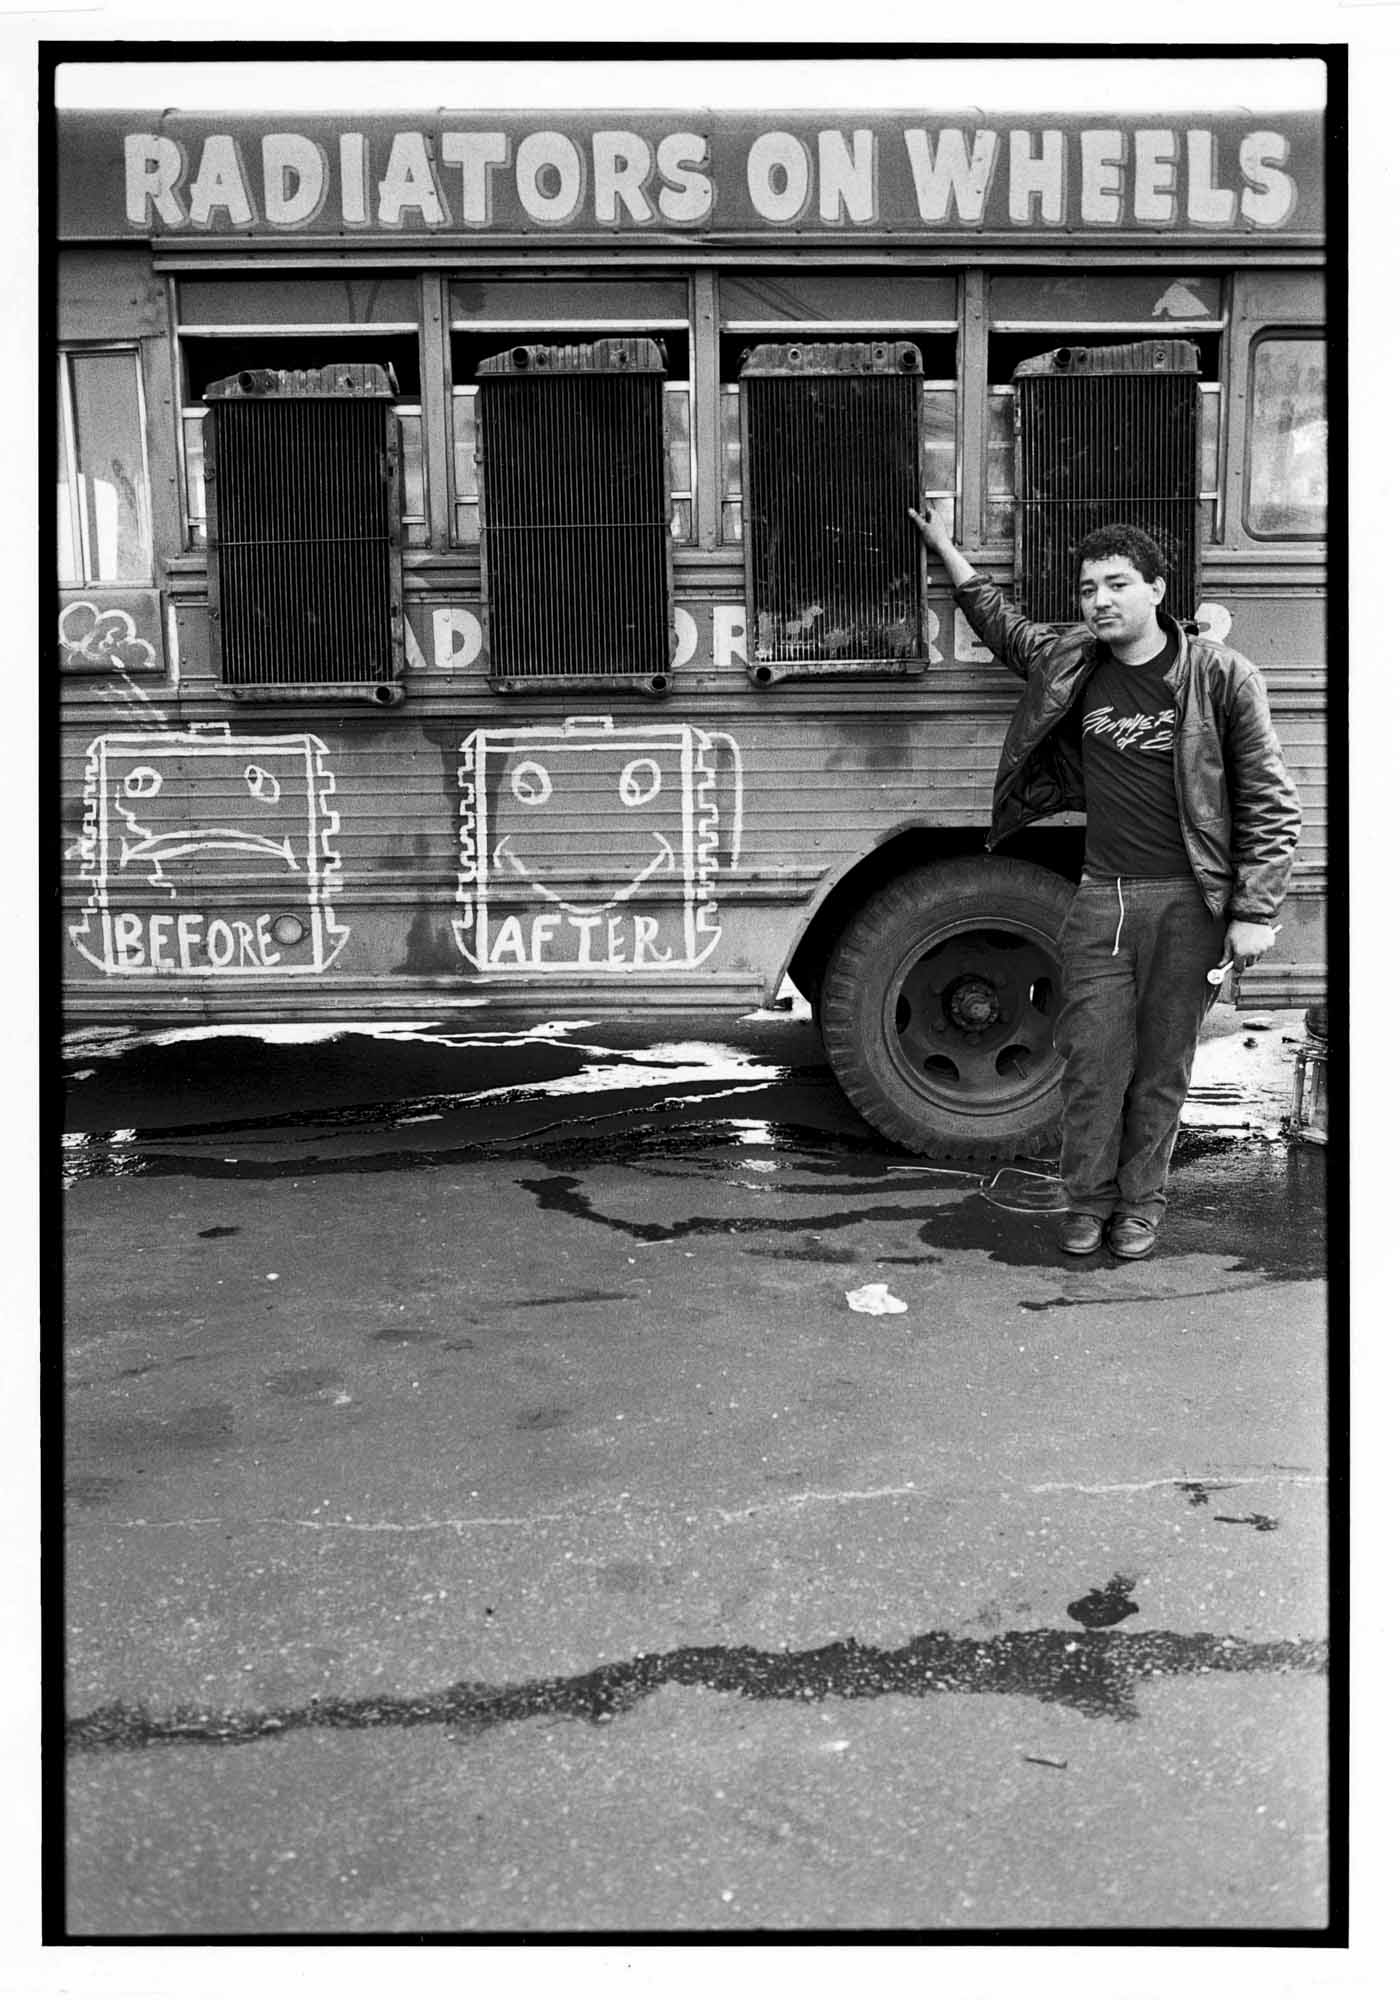 WilliamHeydt-Photographs-C3437-34.jpg